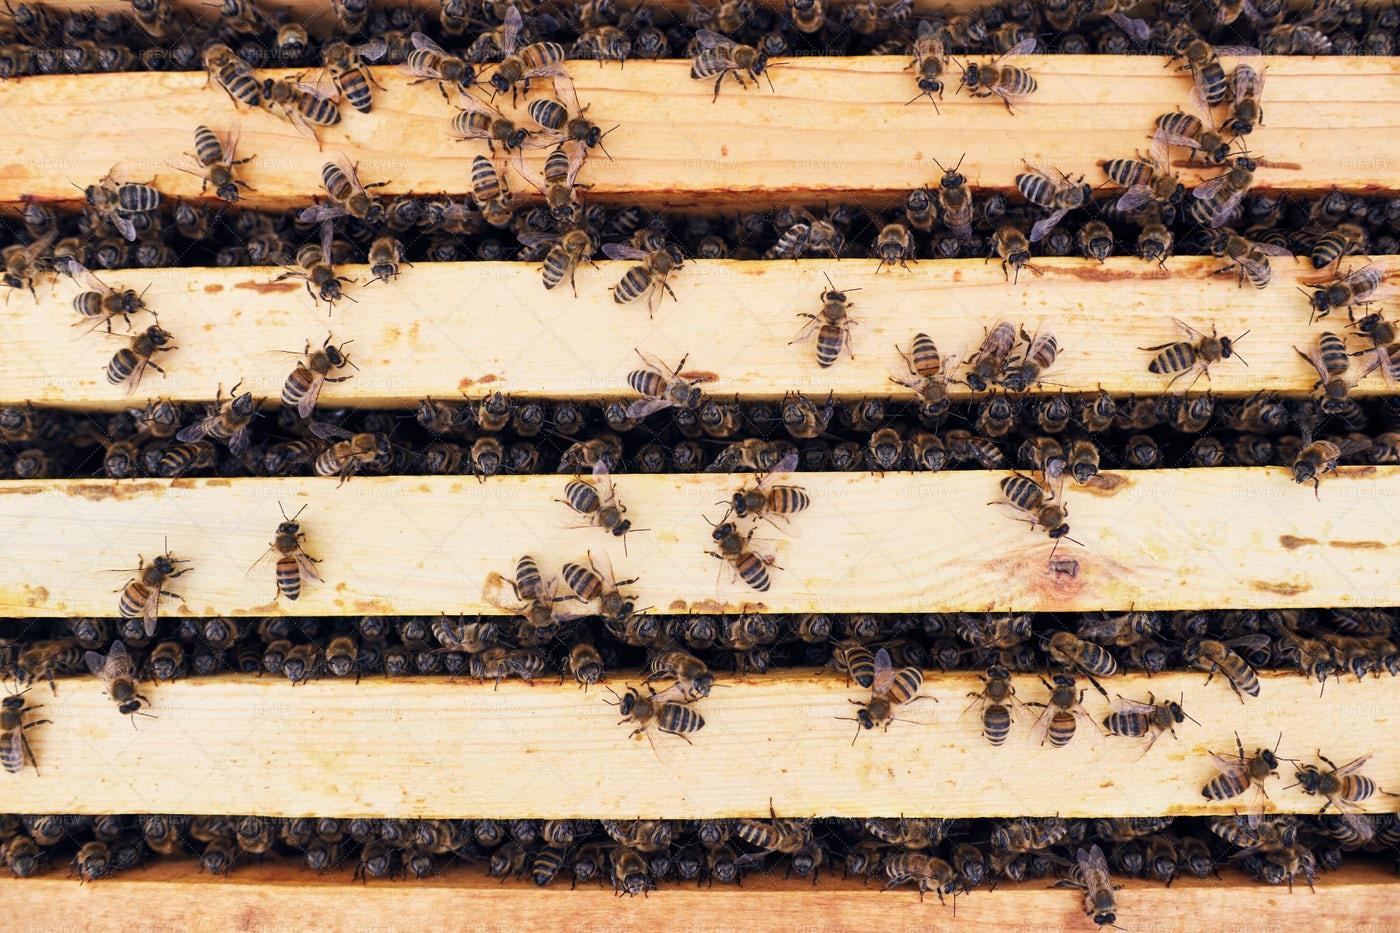 Honey Bees In Apiary: Stock Photos